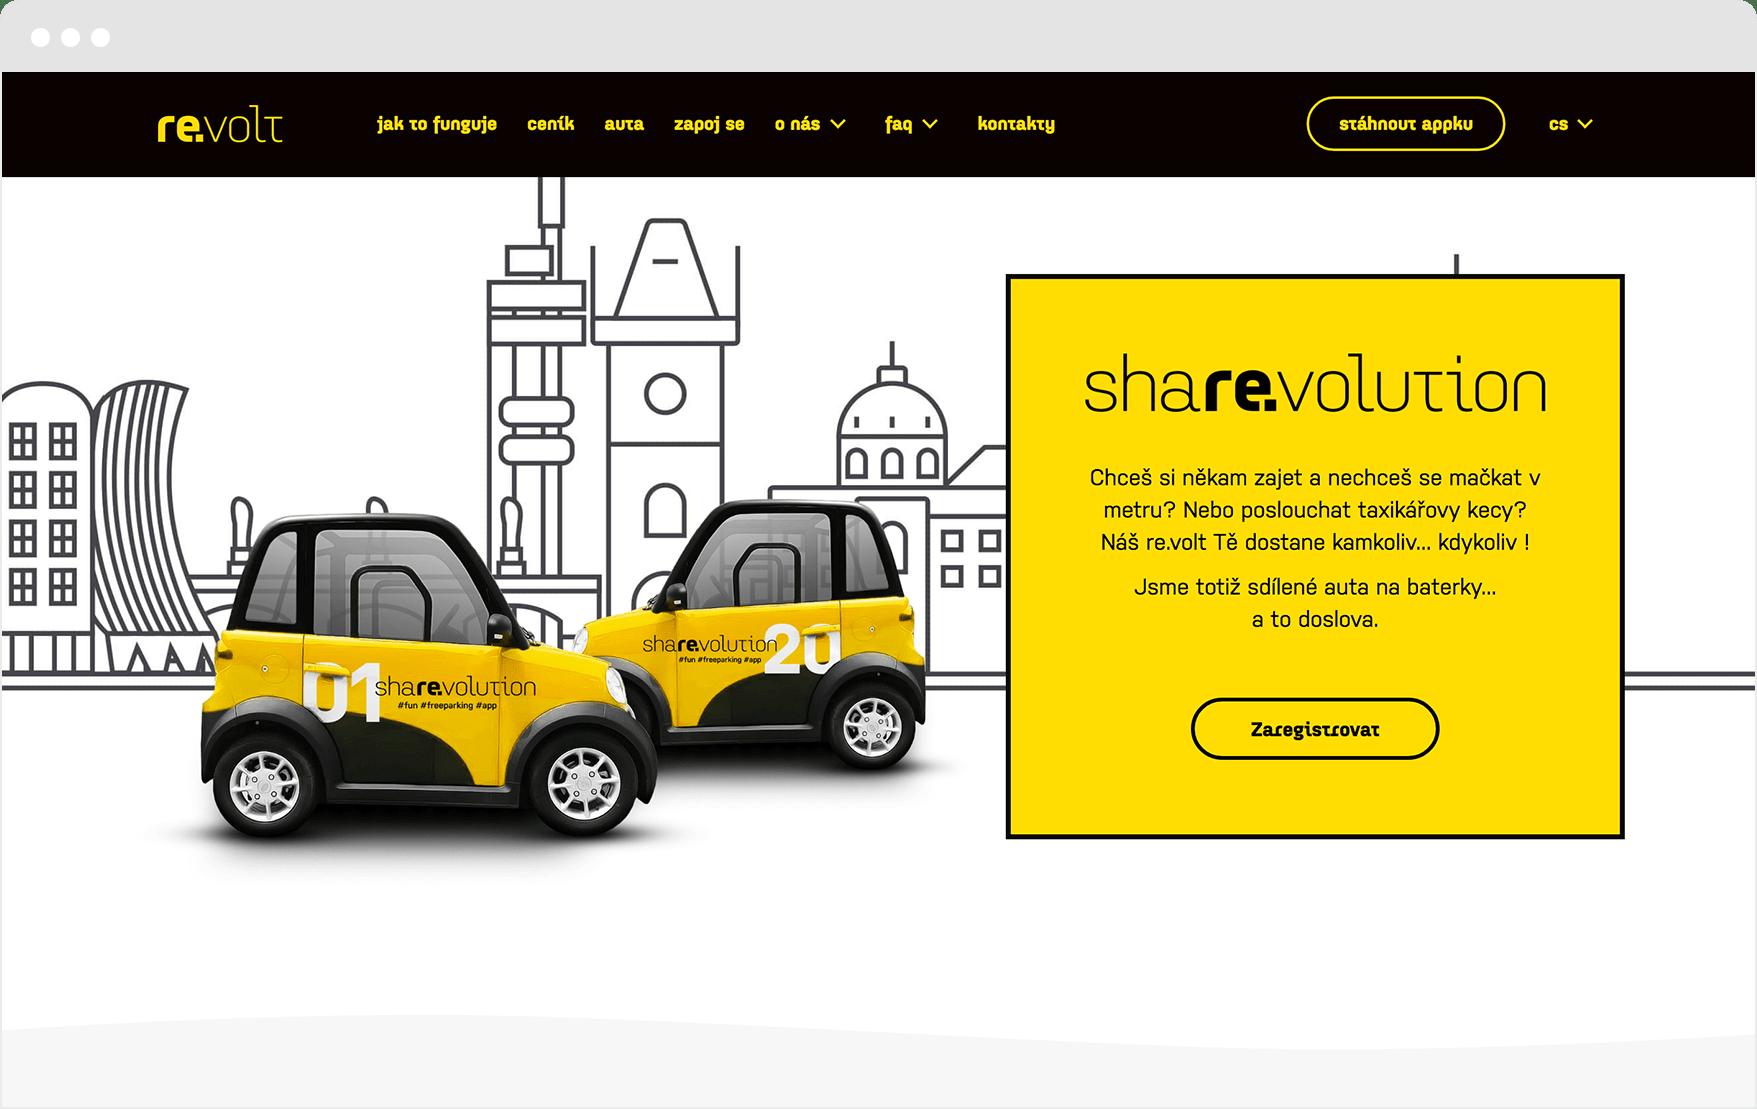 reference www.revolt.cz